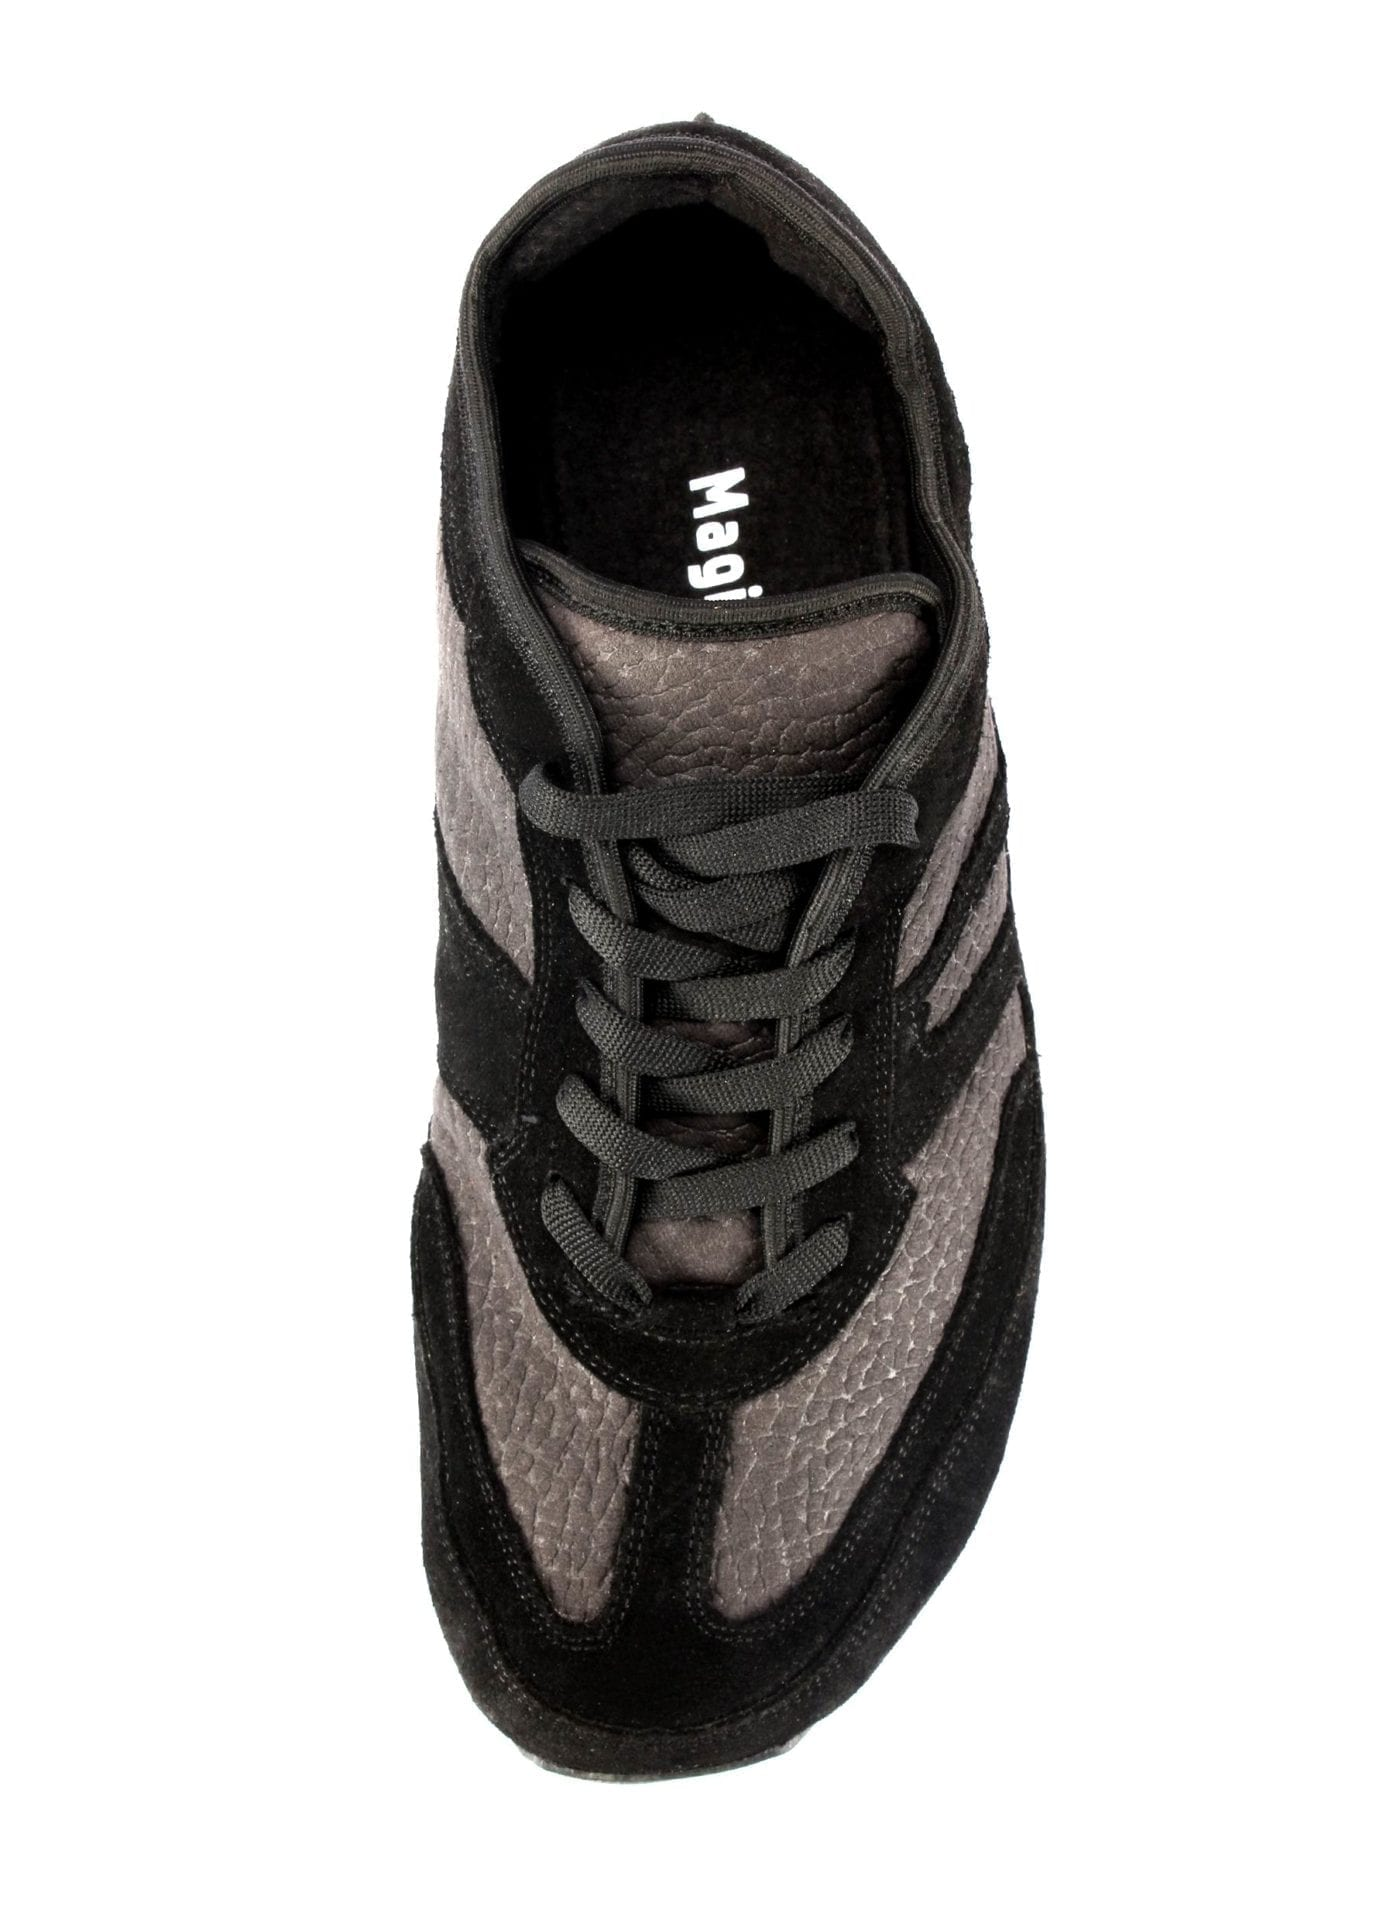 Magical Shoes BAREFOOT SHOES EXPLORER AUTUMN BARIBAL KIDS picture 4